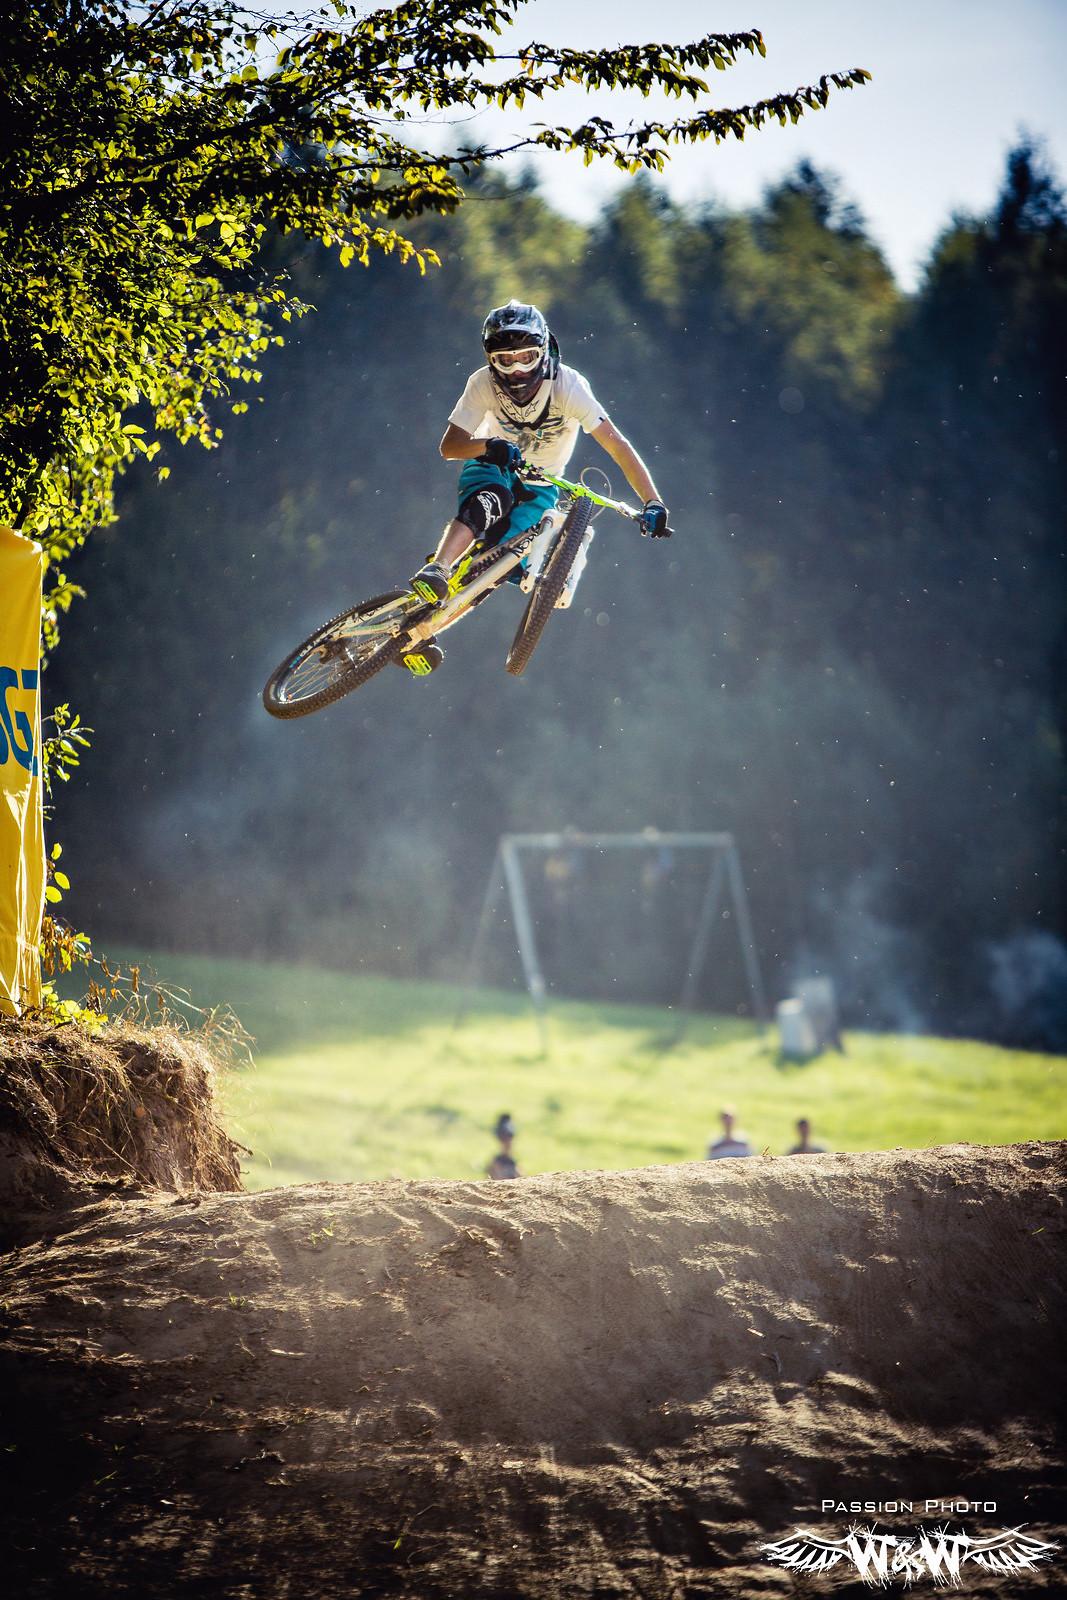 air - JawsMtb - Mountain Biking Pictures - Vital MTB